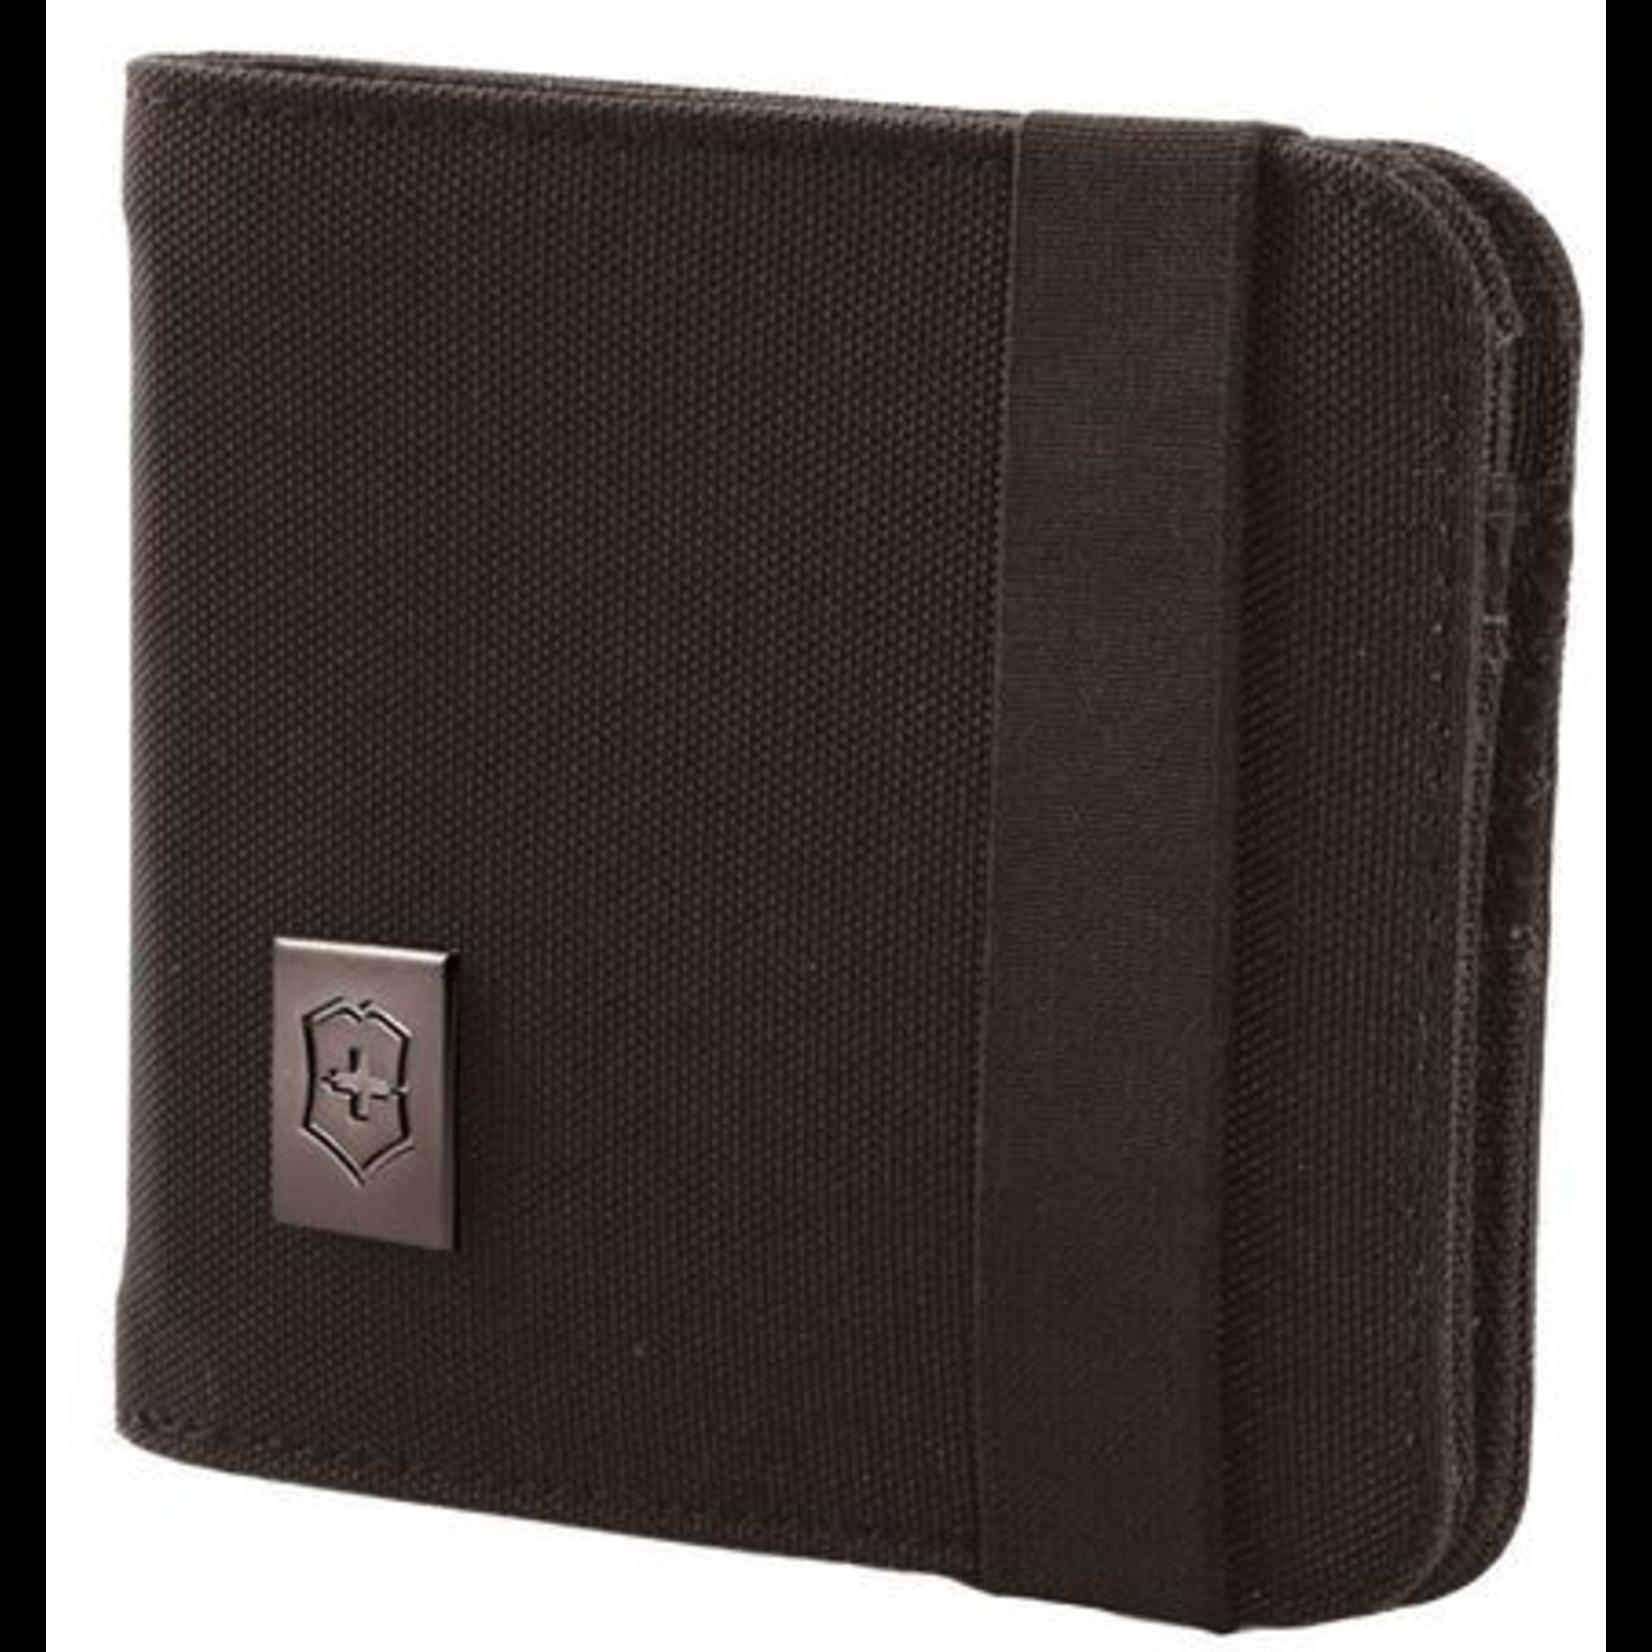 Victorinox Victorinox portemonnee Bi-Fold, zwart